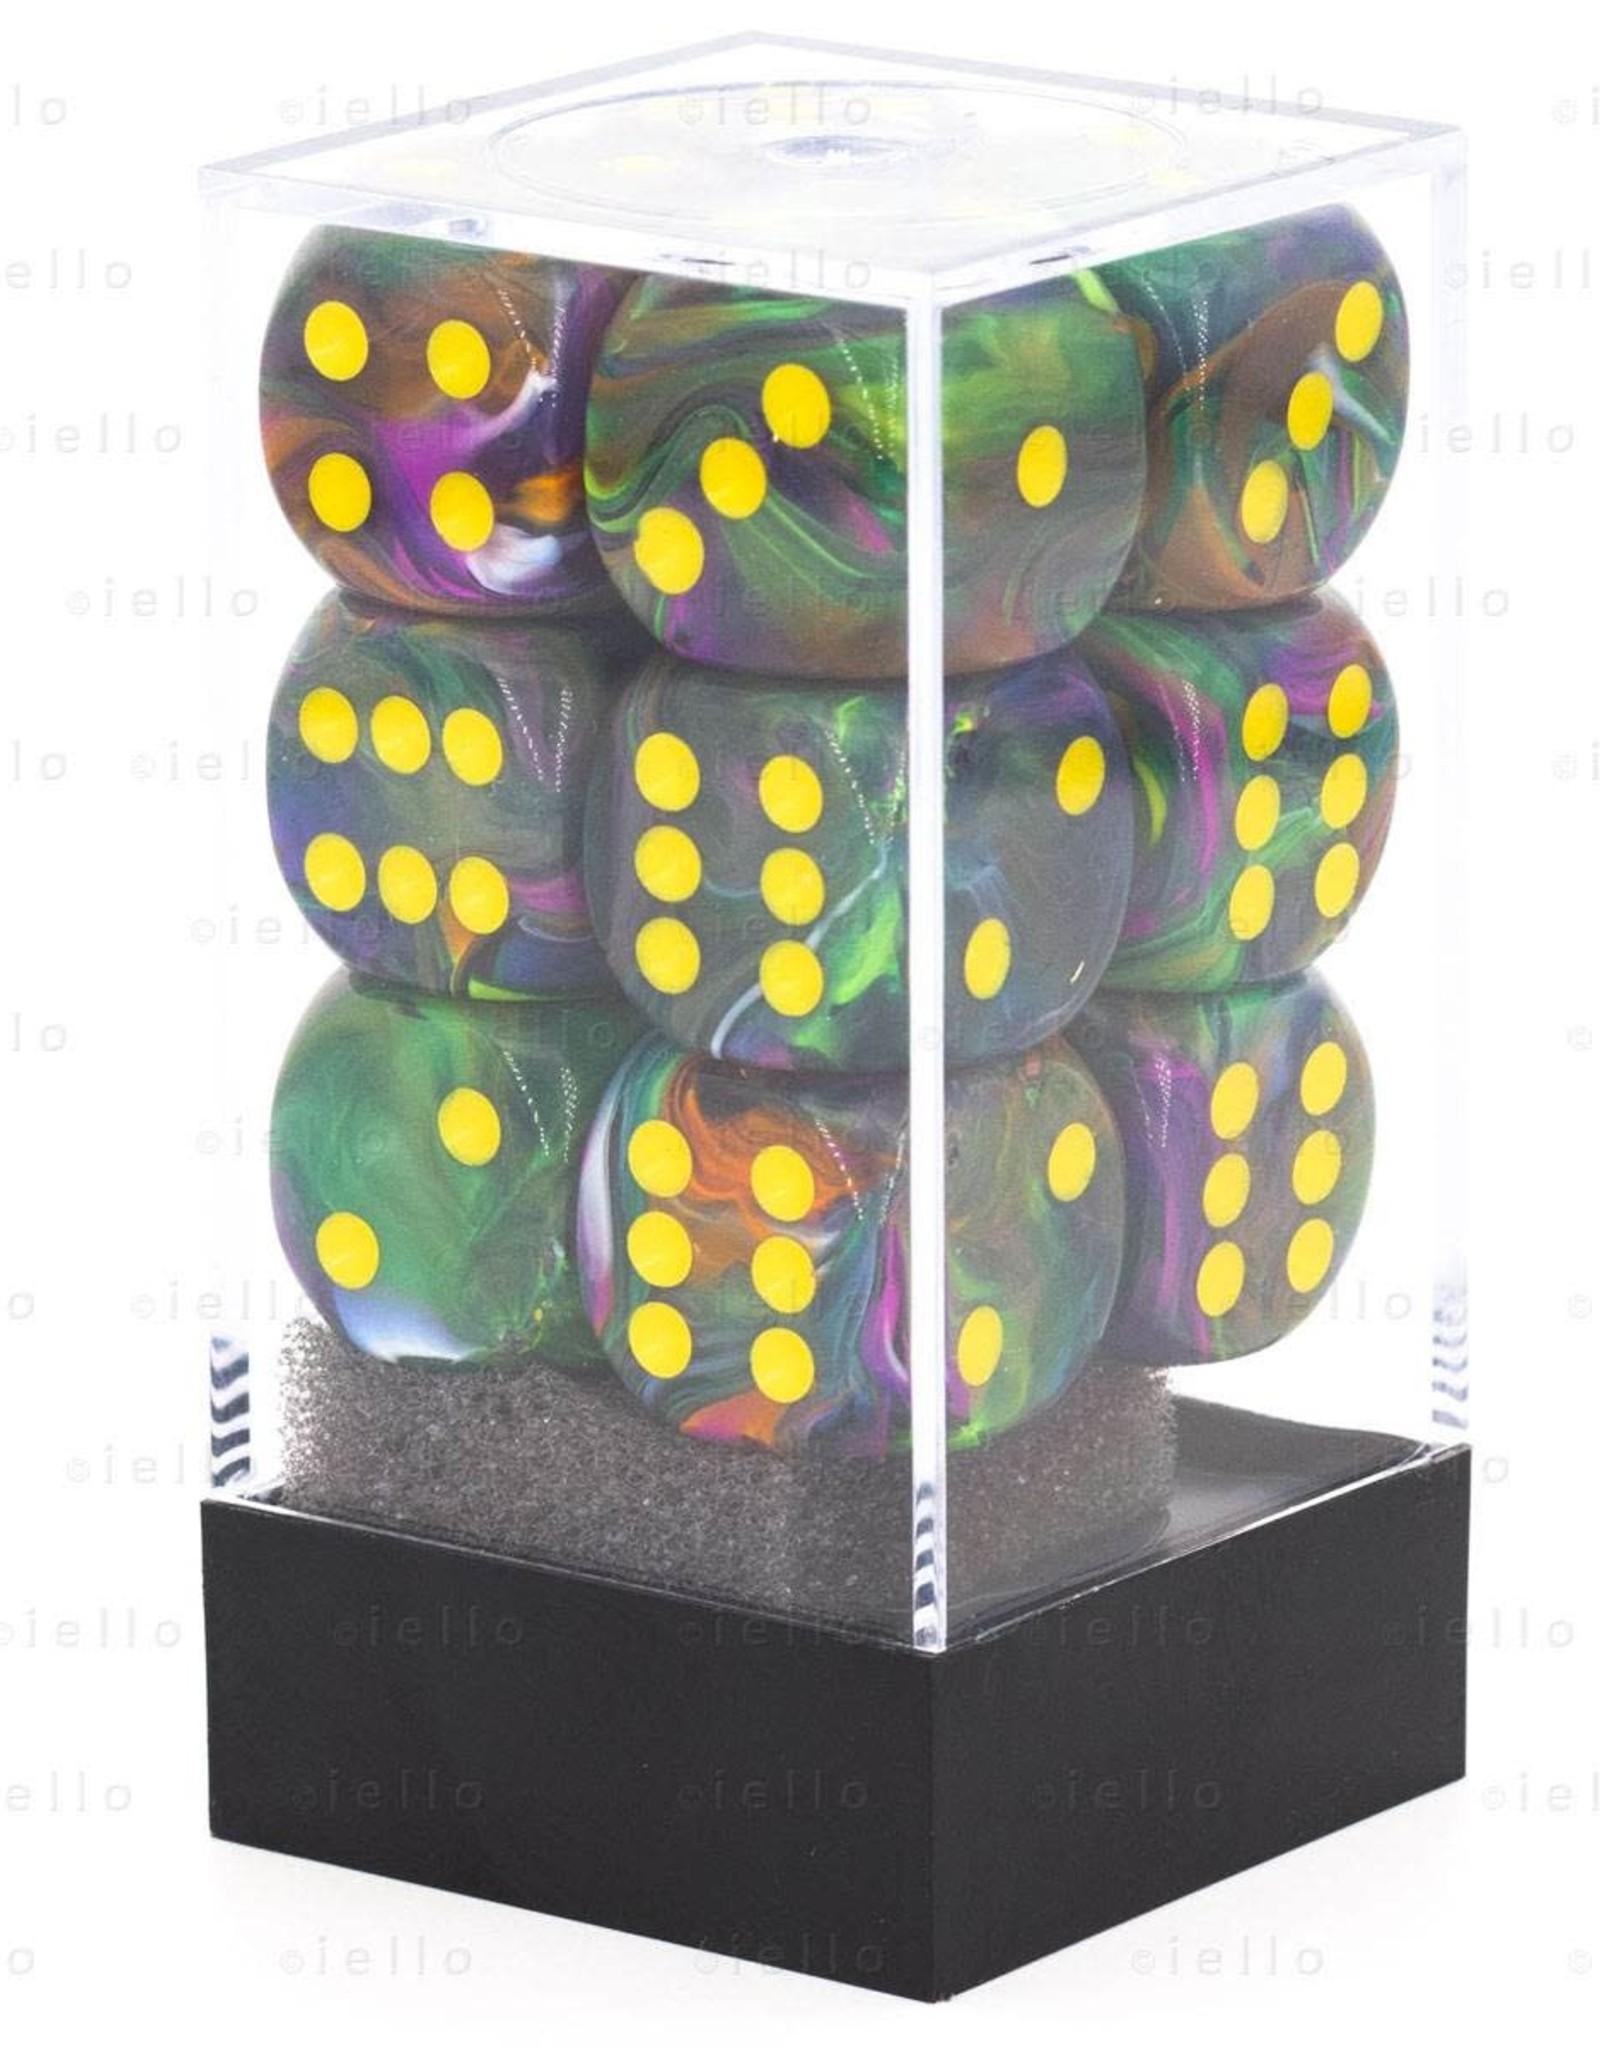 Chessex DICE FESTIVE 12D6 RIO W/YELLOW 16MM